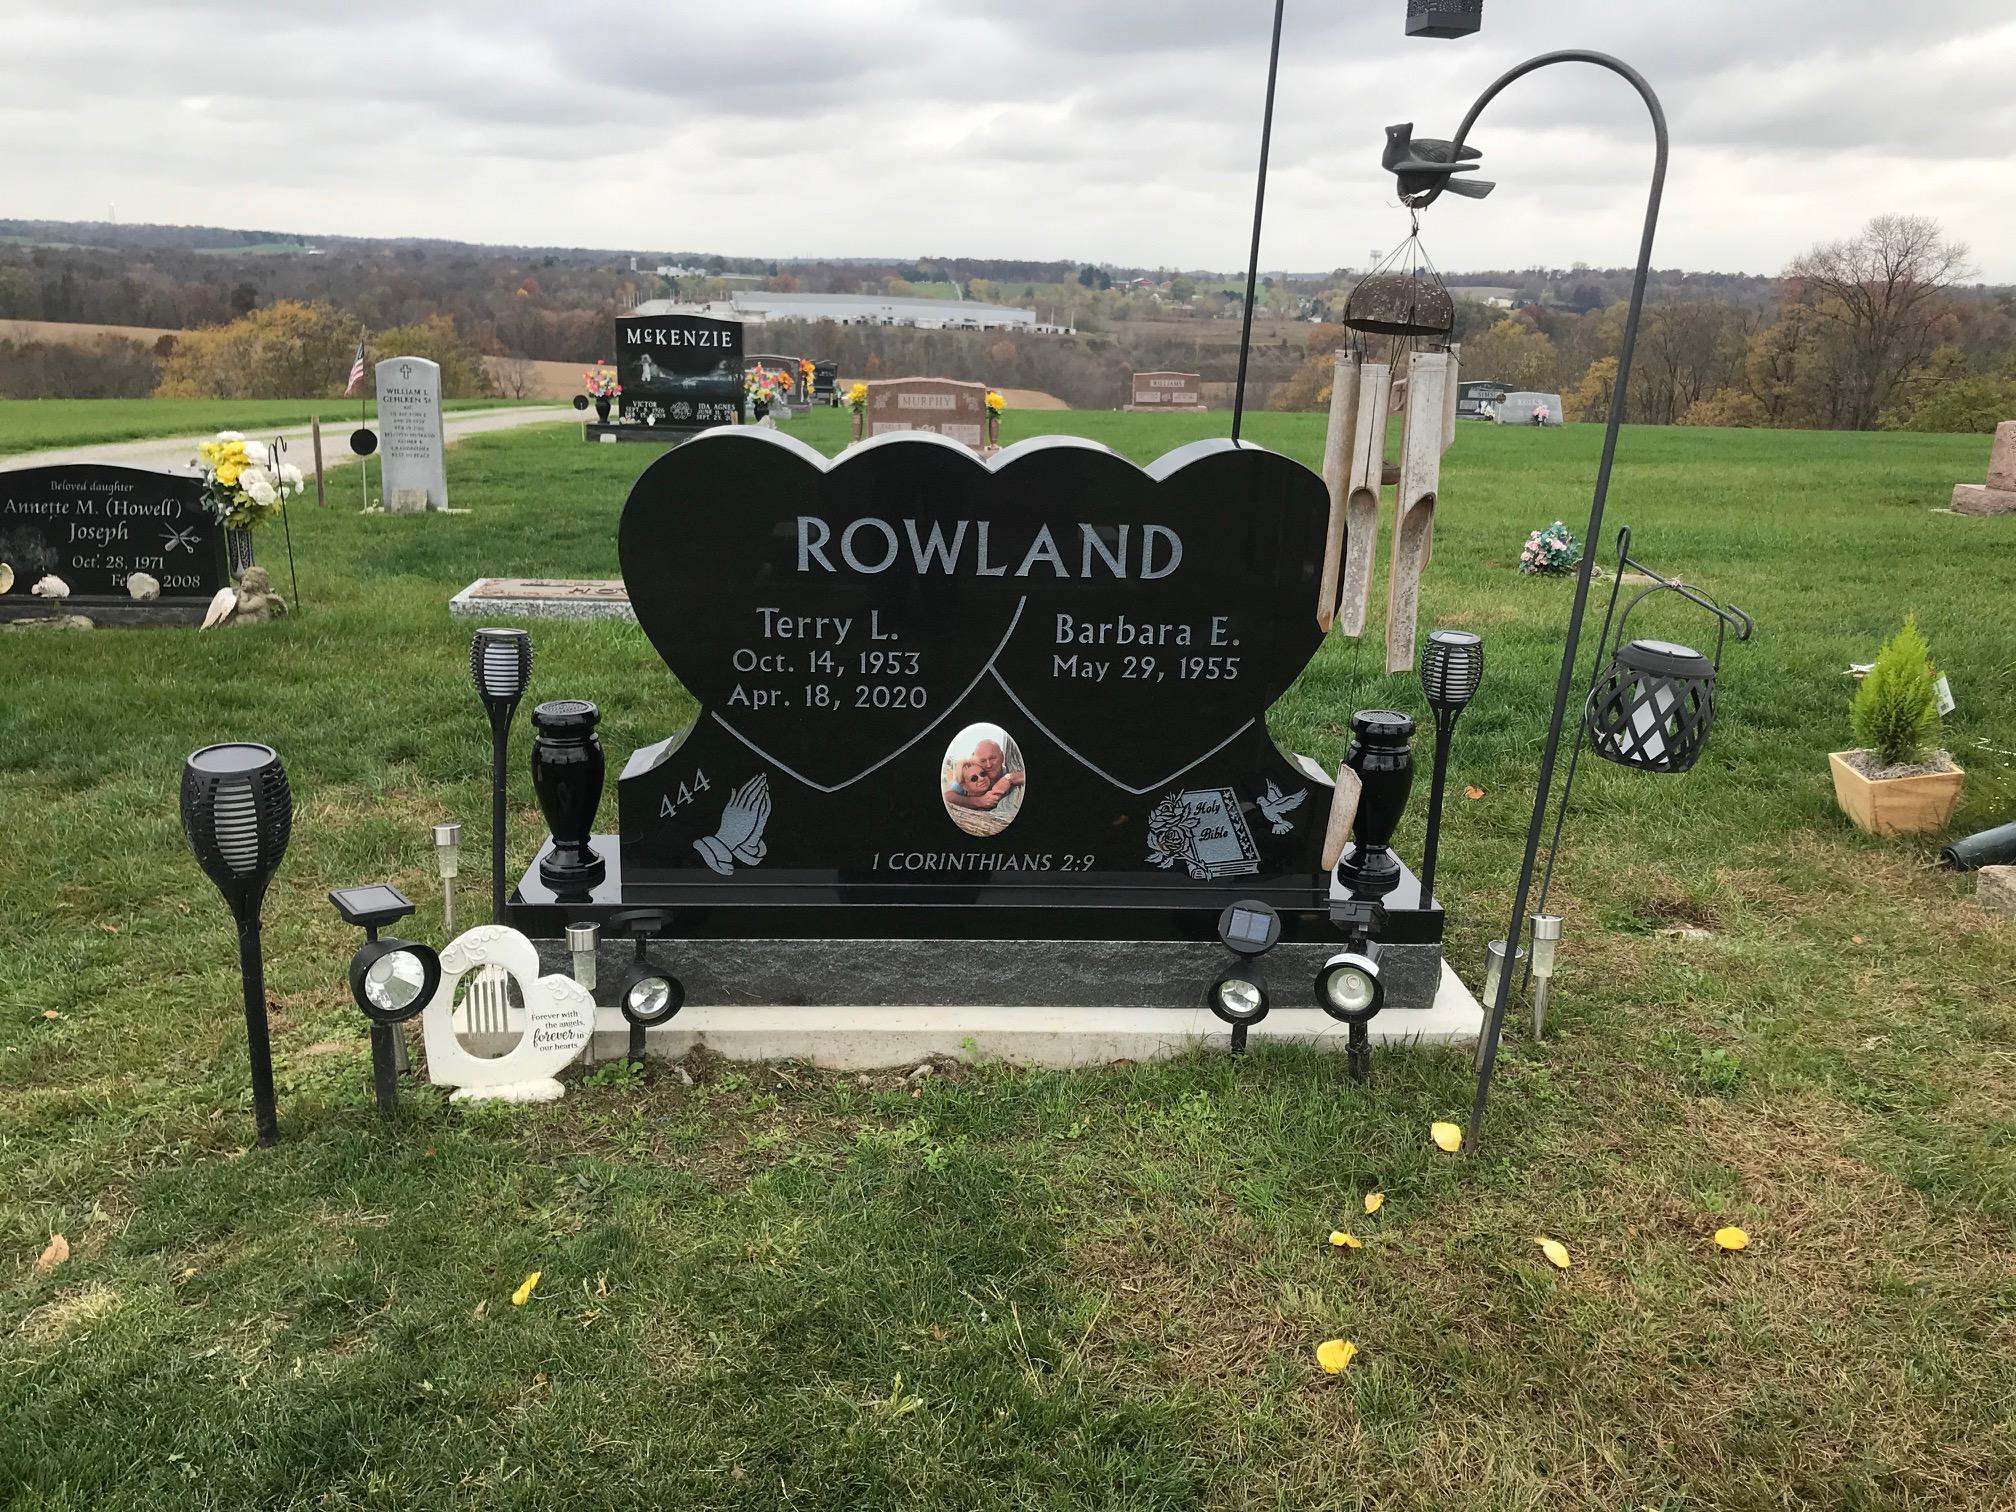 Rowland, Terry